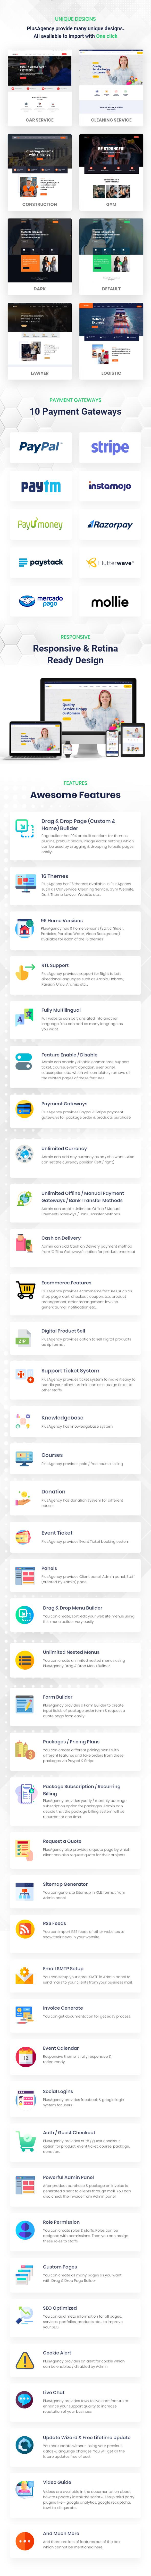 PlusAgency - Multipurpose Website CMS & Business Agency Management System - 6